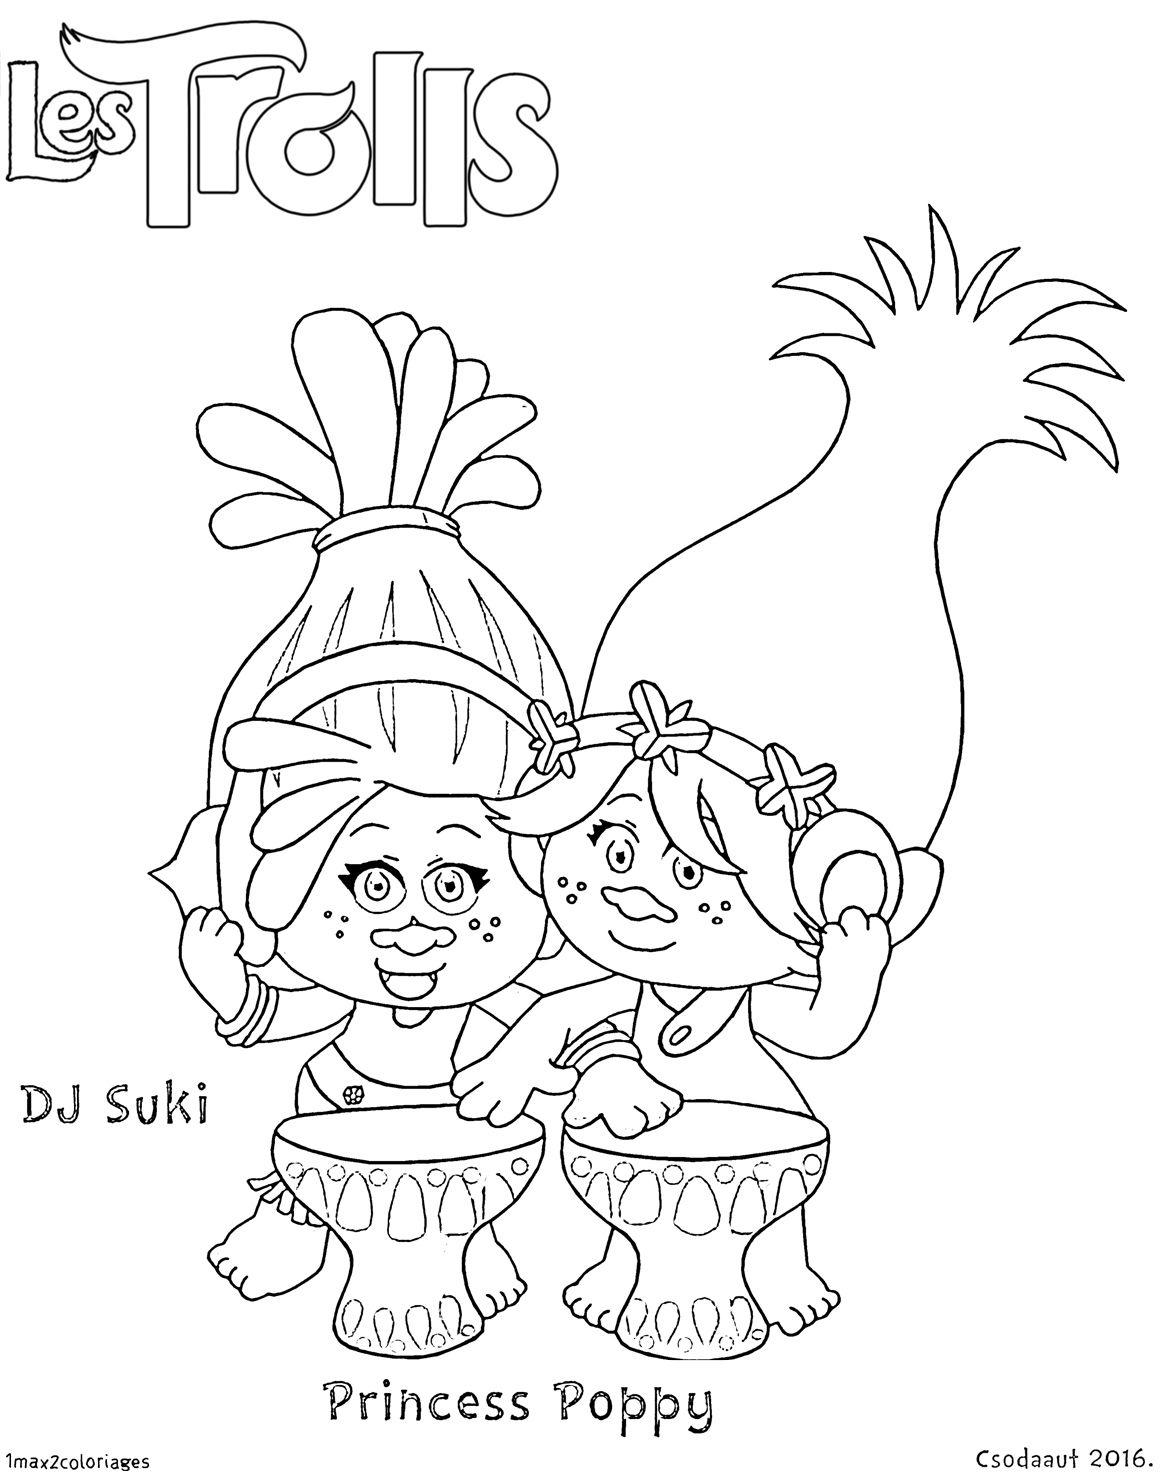 Coloriage Dj Suki Et Princesse Poppy | Coloriage concernant Dessin De Troll